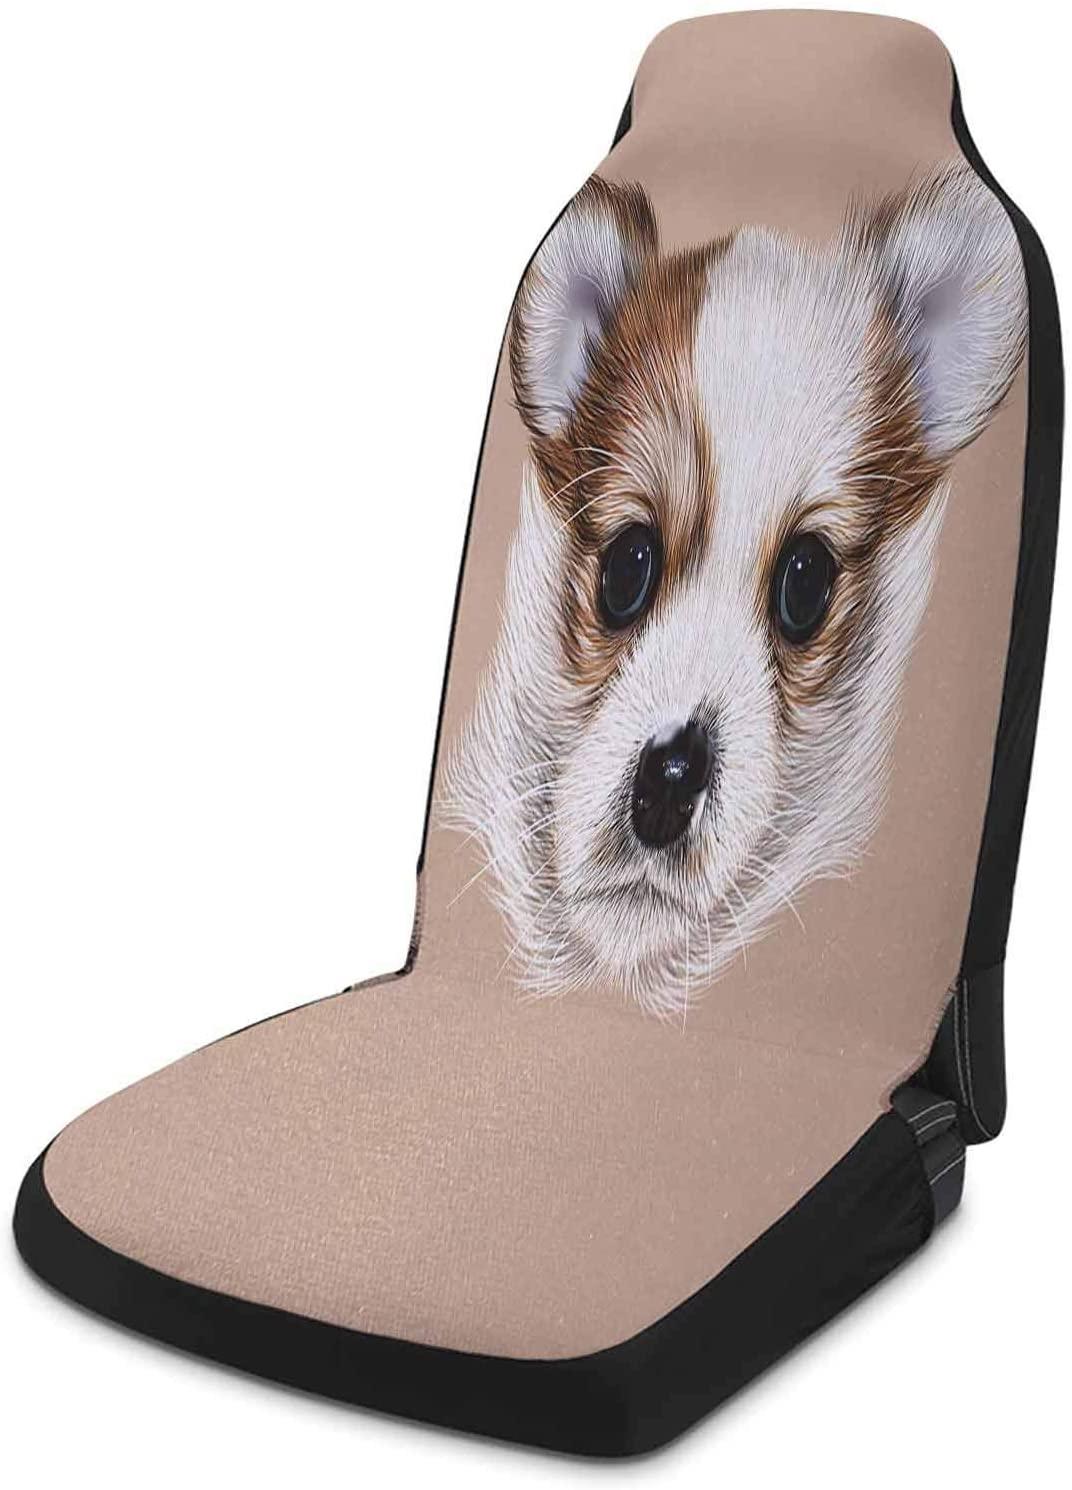 Custom Car Seat Covers 1 Piece, Animal Auto Seat Cover - Puppy Portrait Cute Little Furry Friend Dog Pet Graphic Art, Warm Taupe Beige Light Caramel